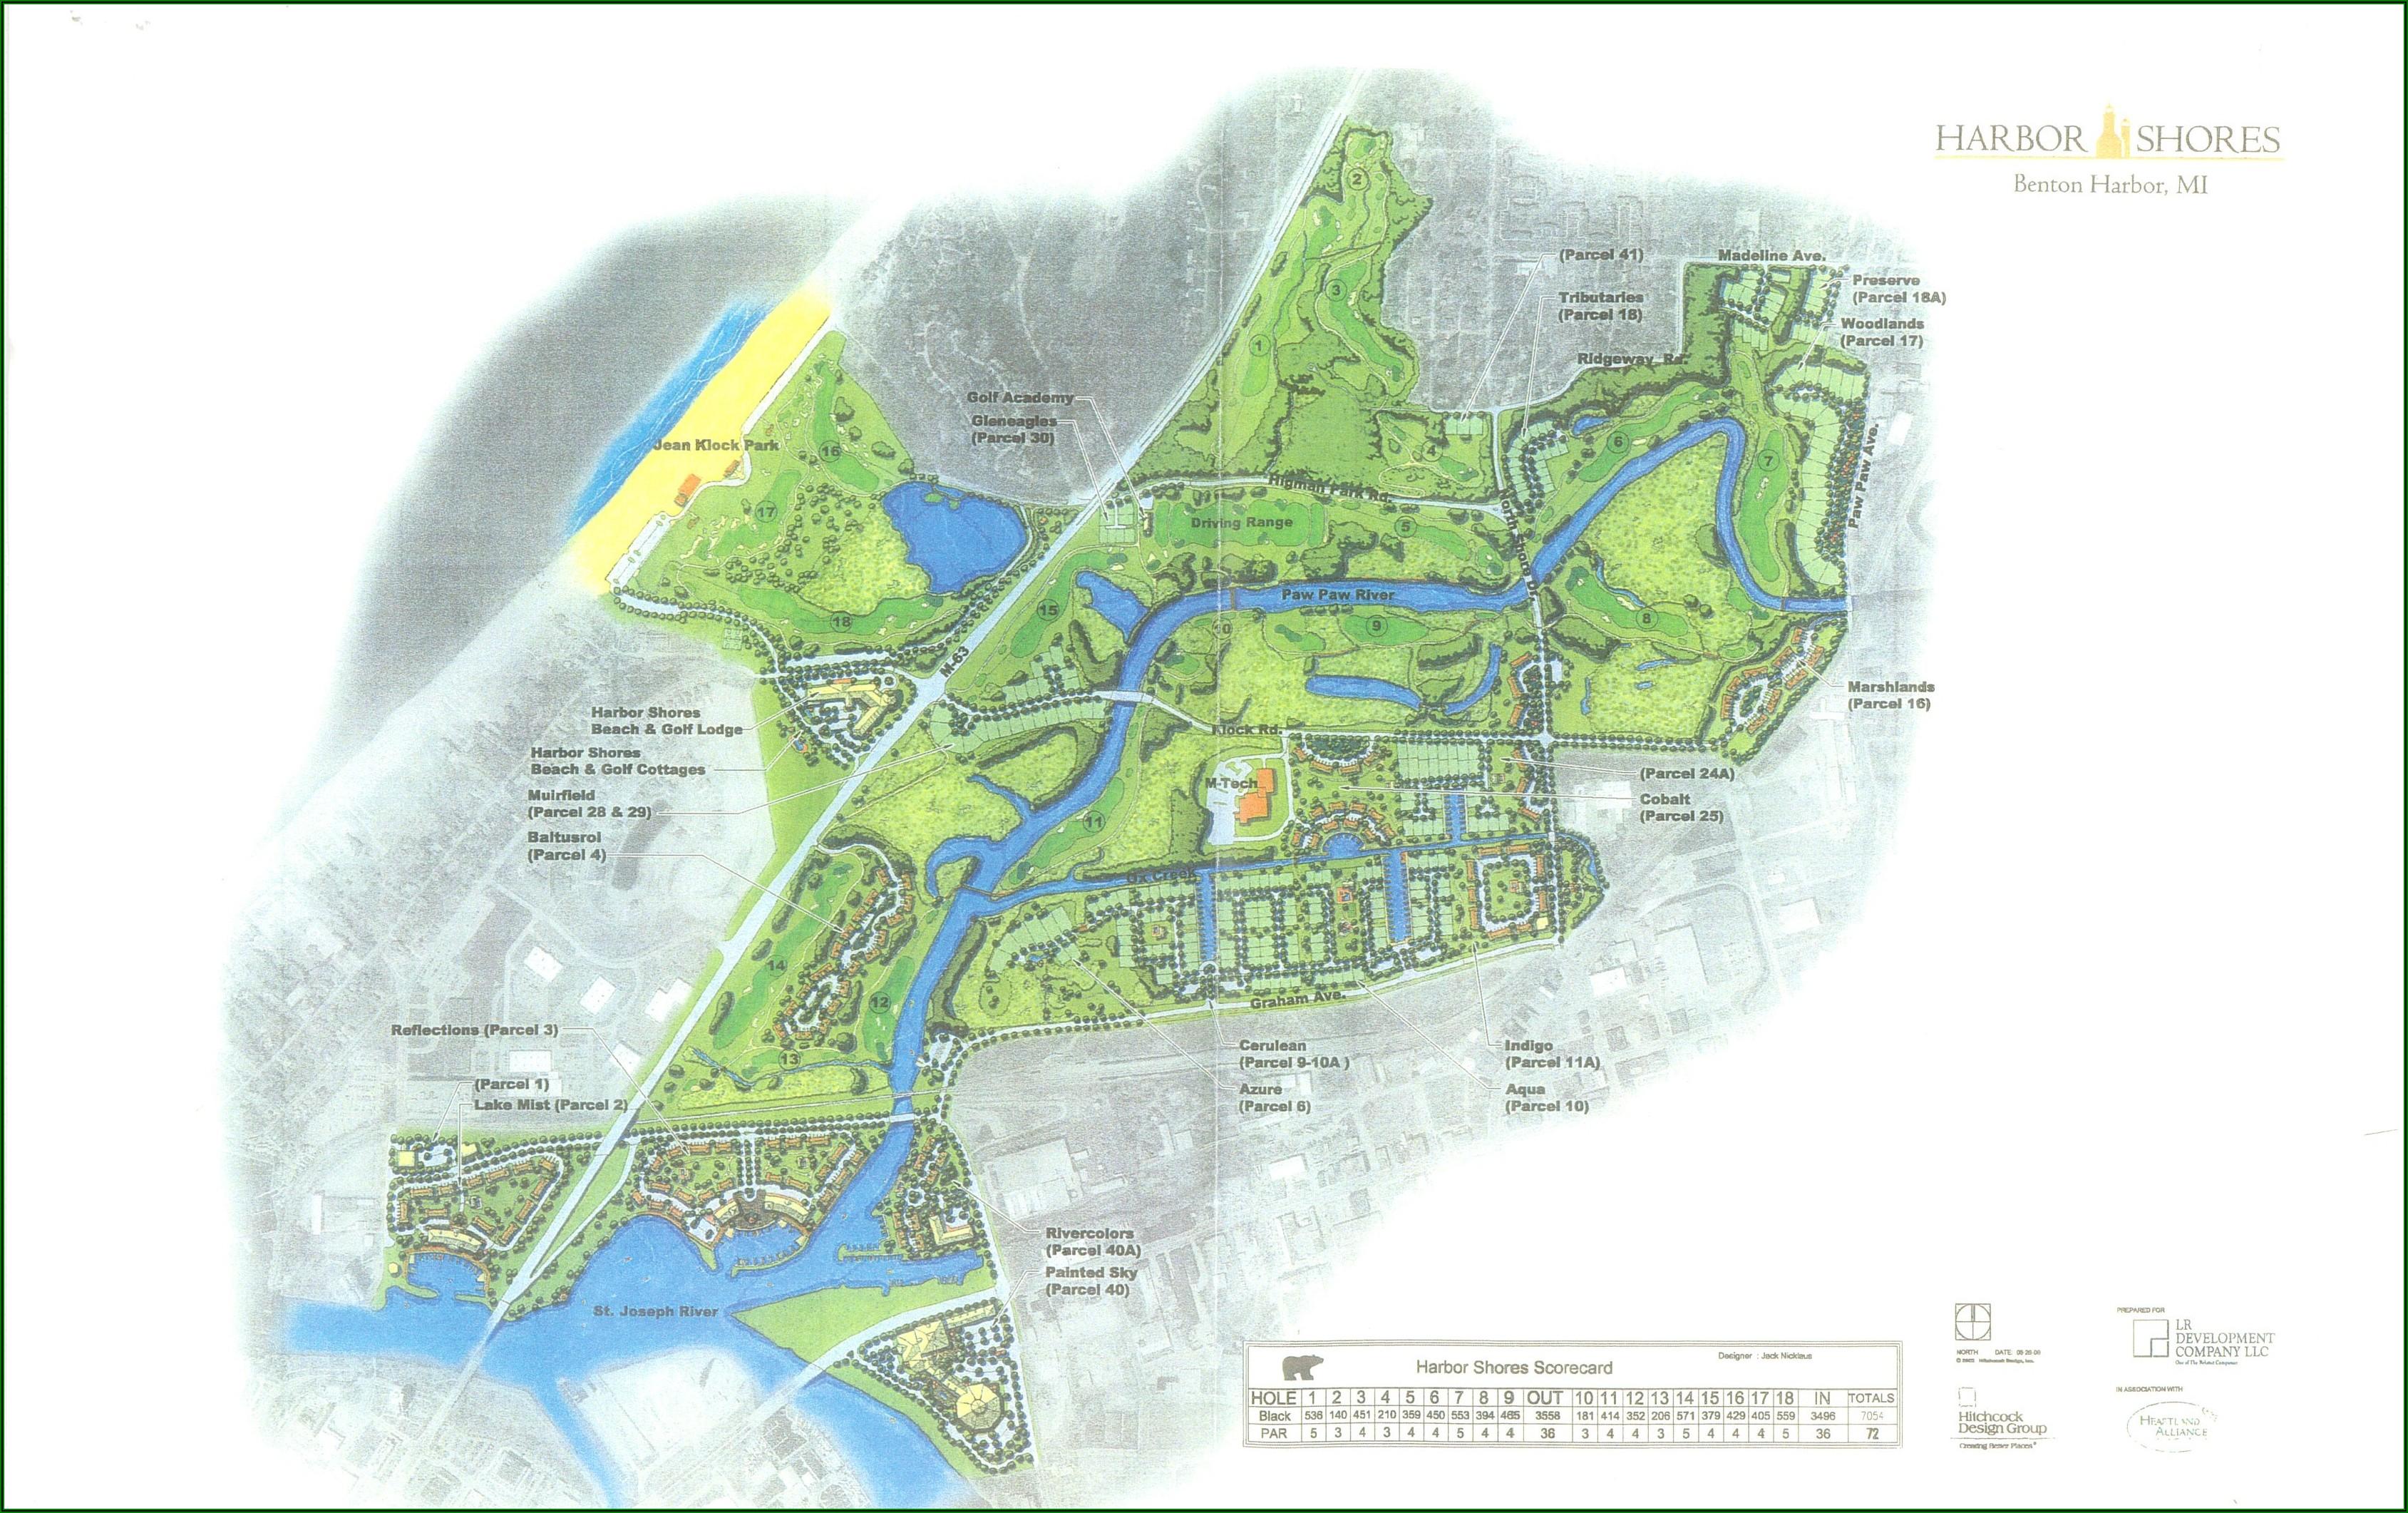 Michigan Golf Resorts Map